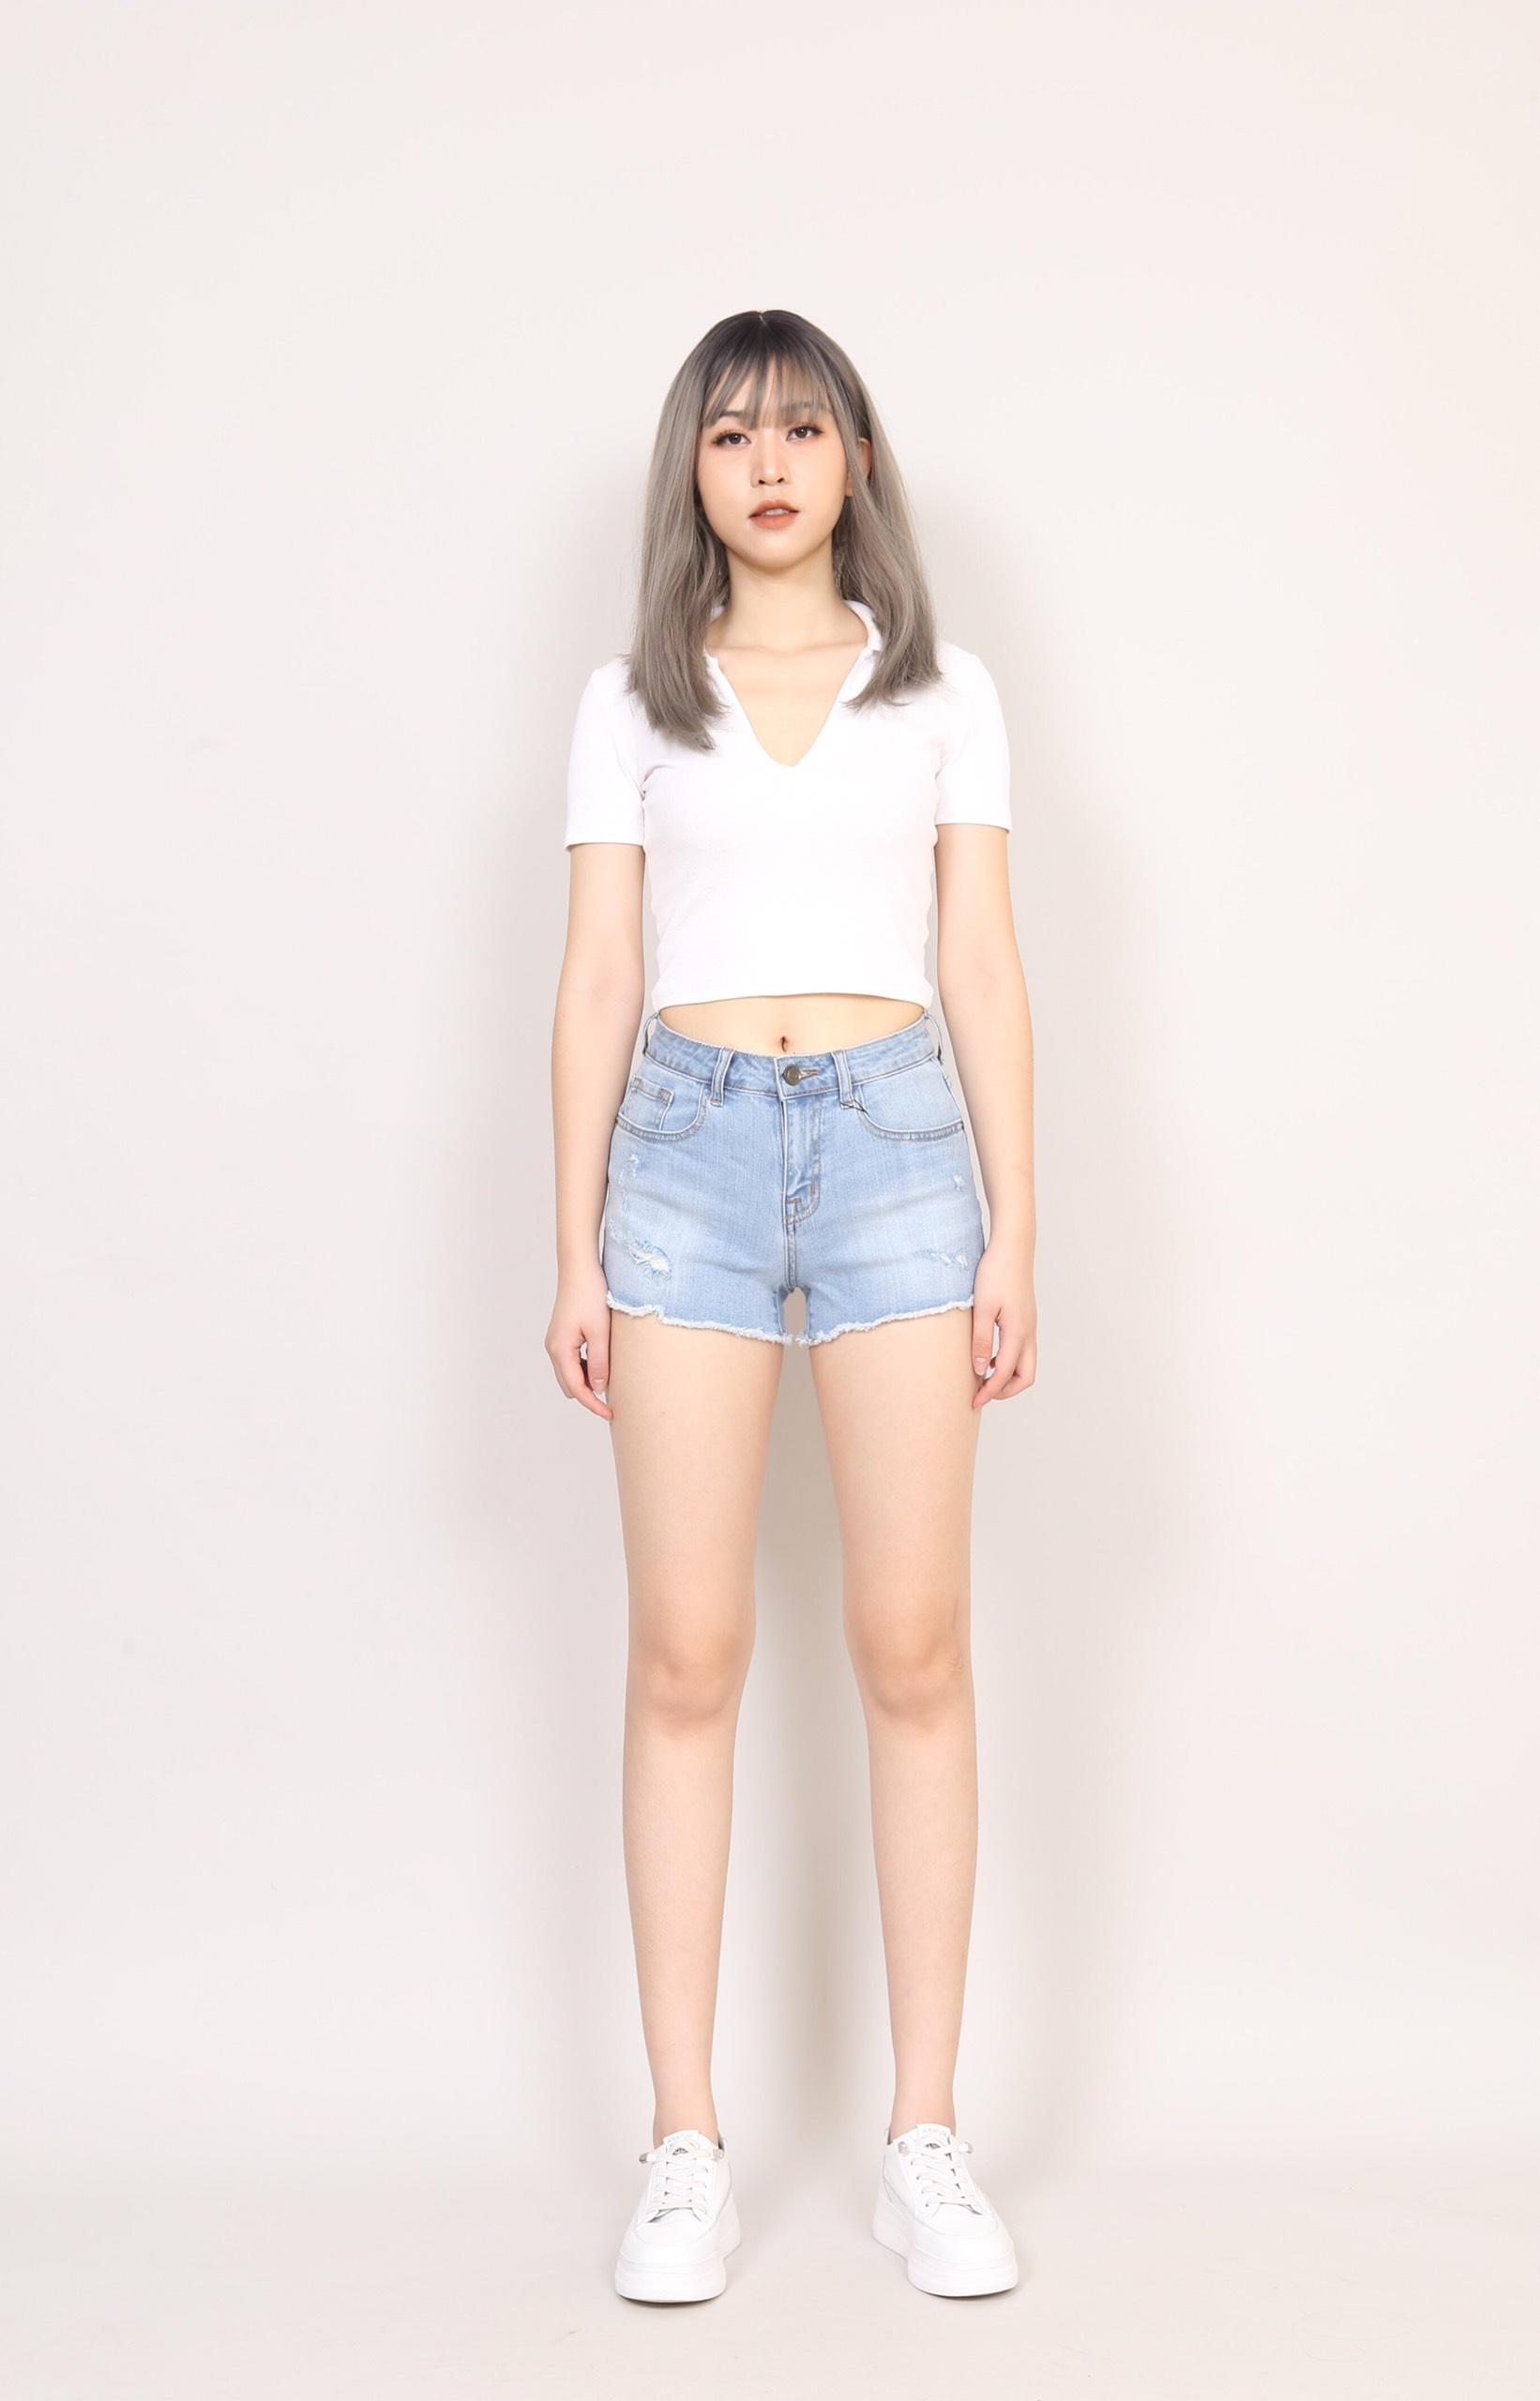 Quần Short Jean Nữ Thời Trang Rách 4 Vết Gấu Tua Rua 304T3, Quần Sooc Jean Nữ Rách Cạp Cao CT Jeans